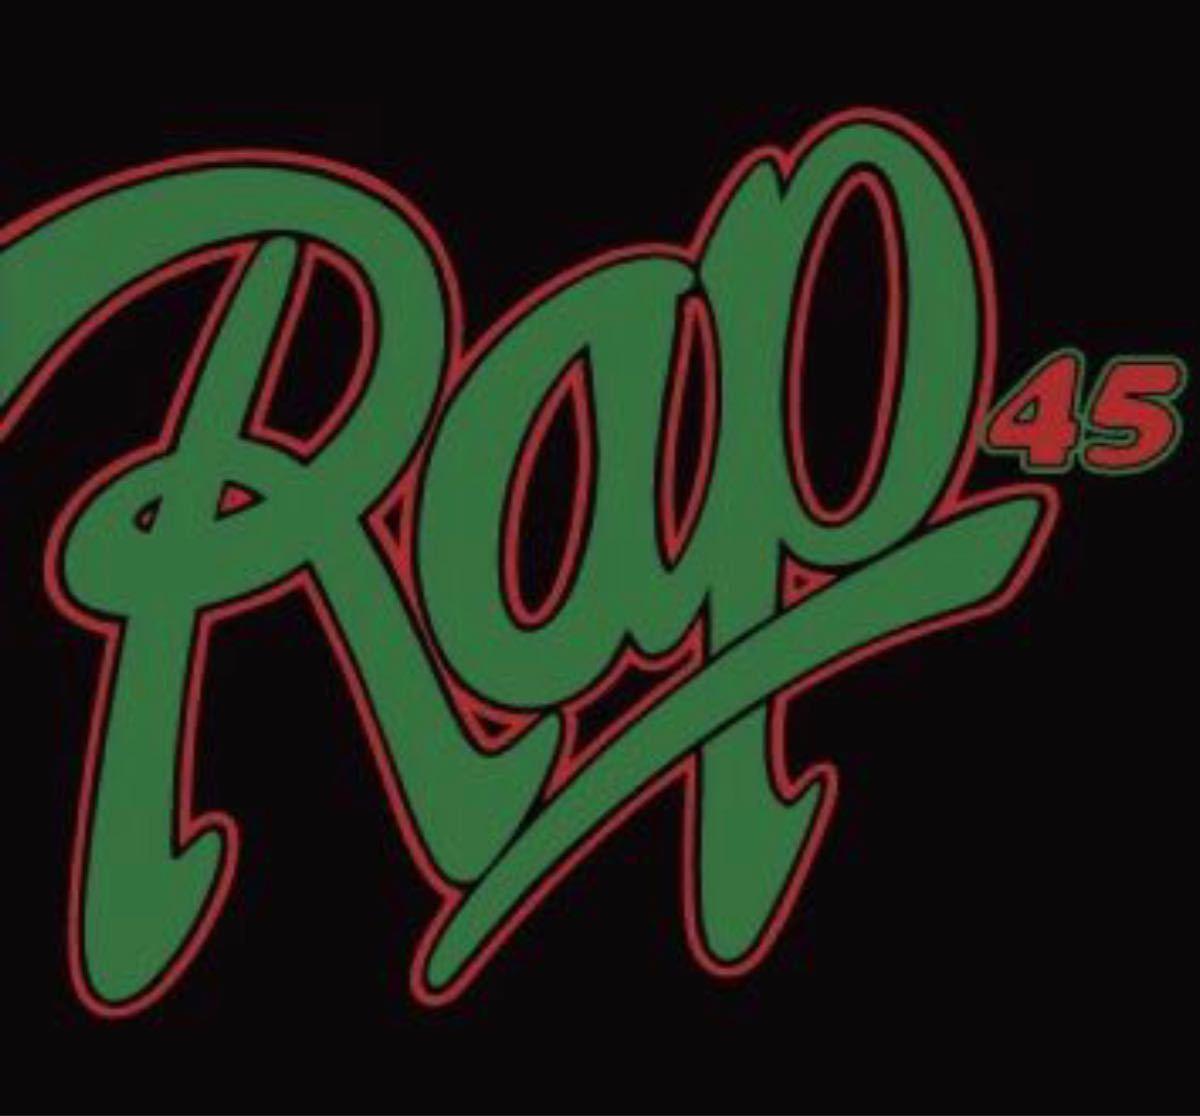 Rap 45 / MURO